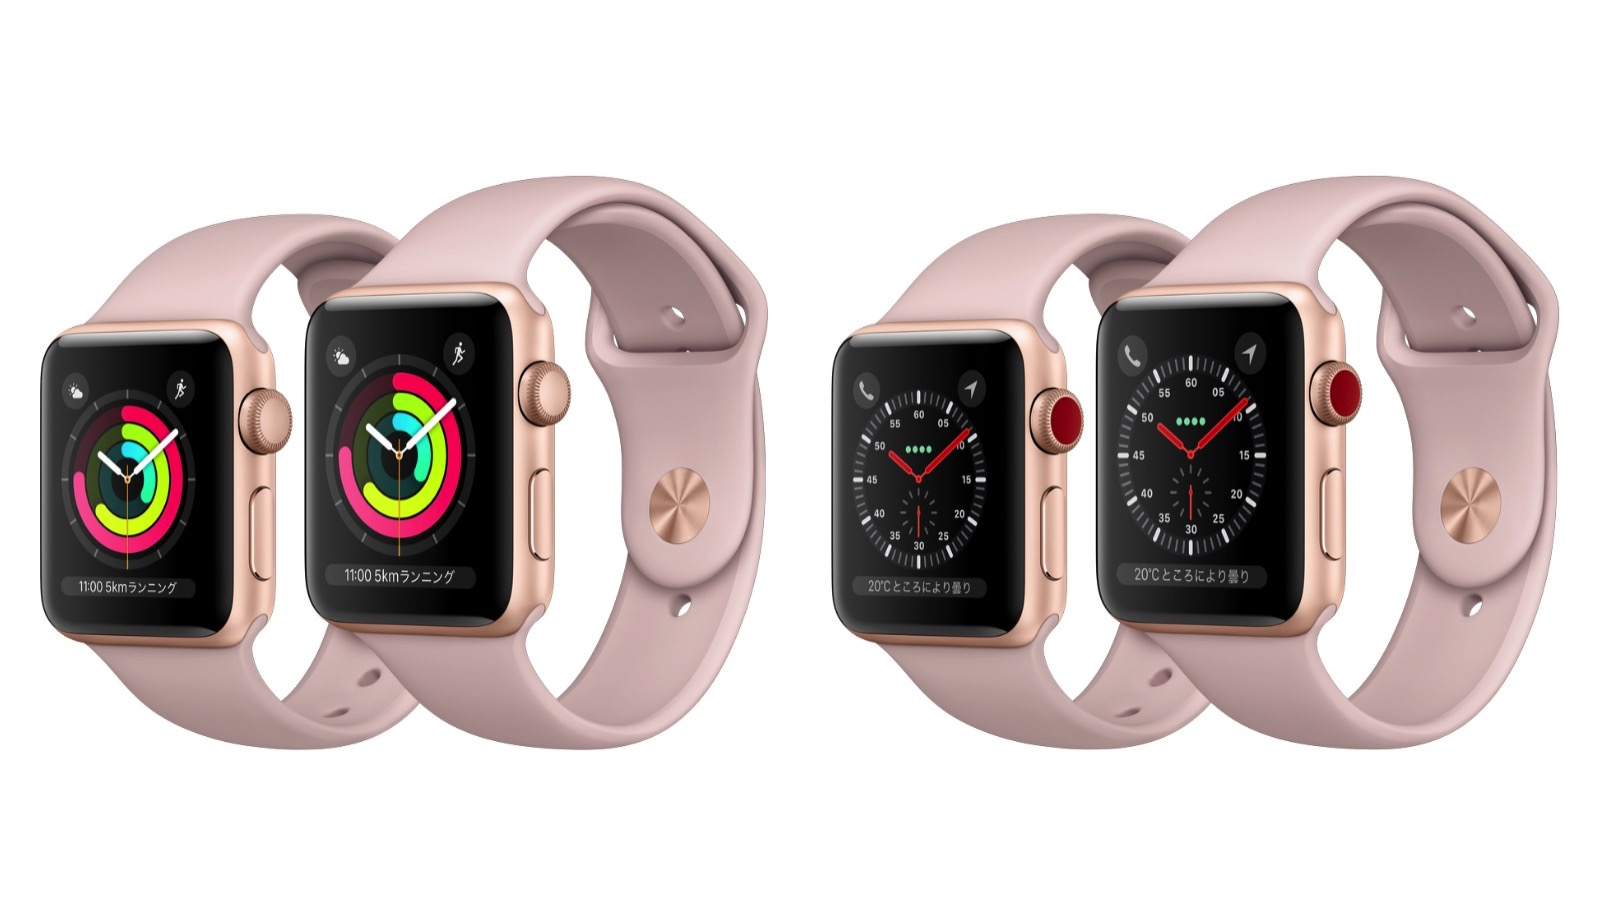 Apple-Watch-Series-3-gold-model.jpg